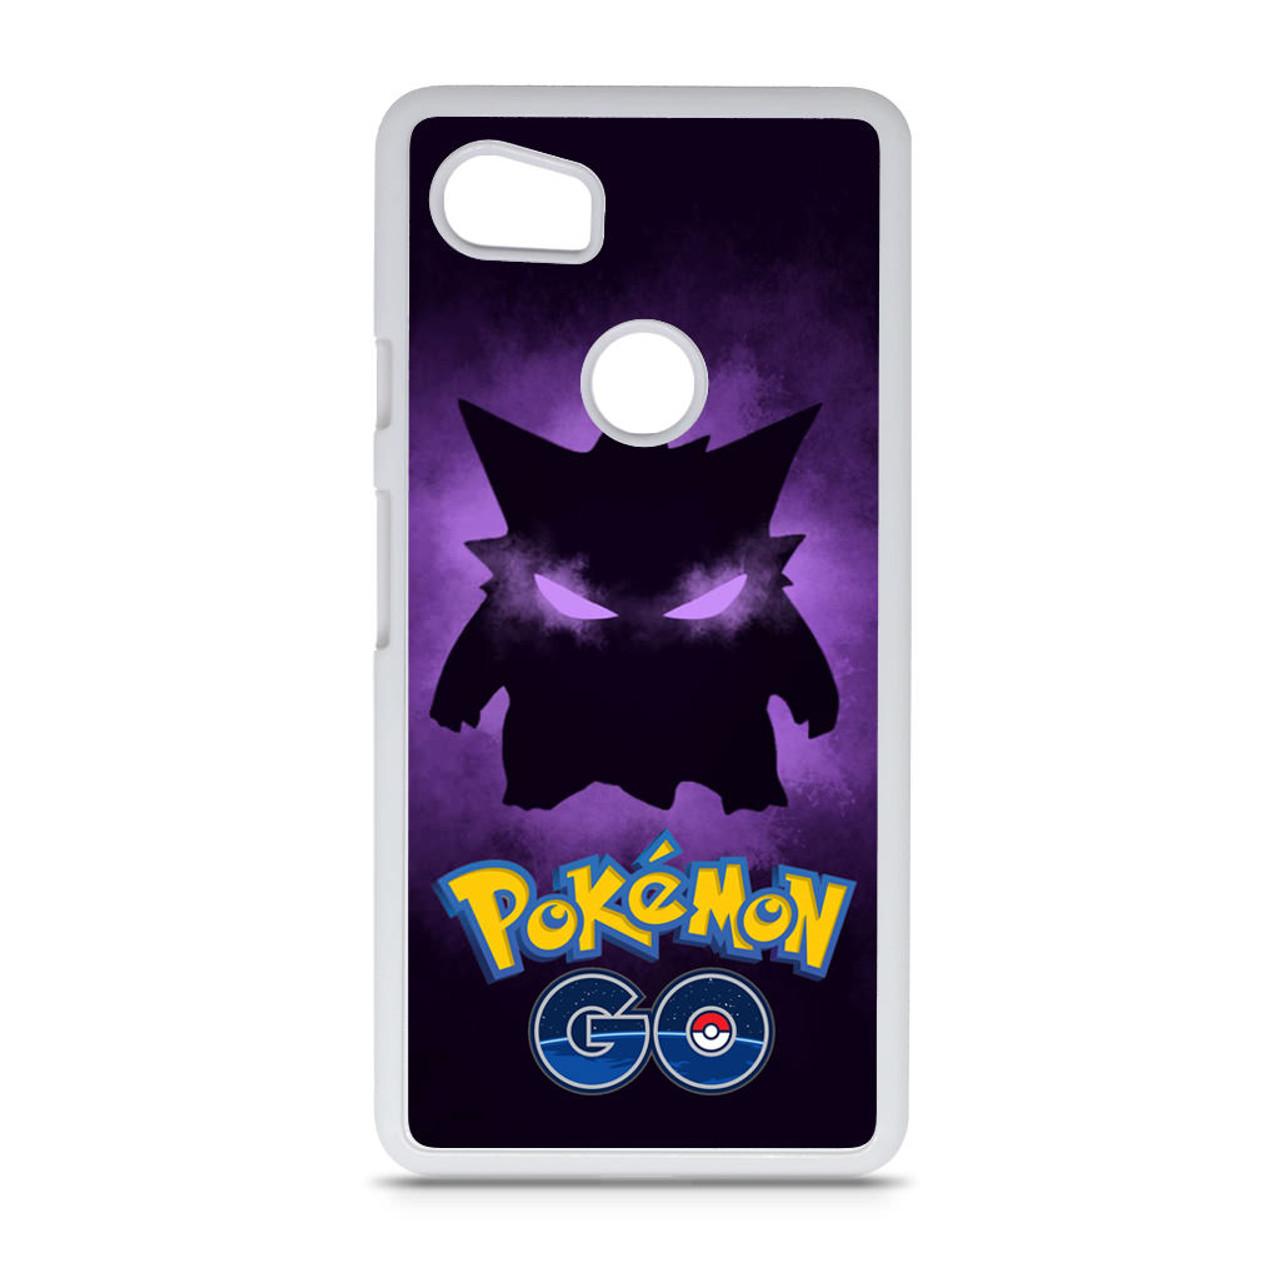 Pokemon GO Got the Gengar Google Pixel 2 XL Case - GGIANS